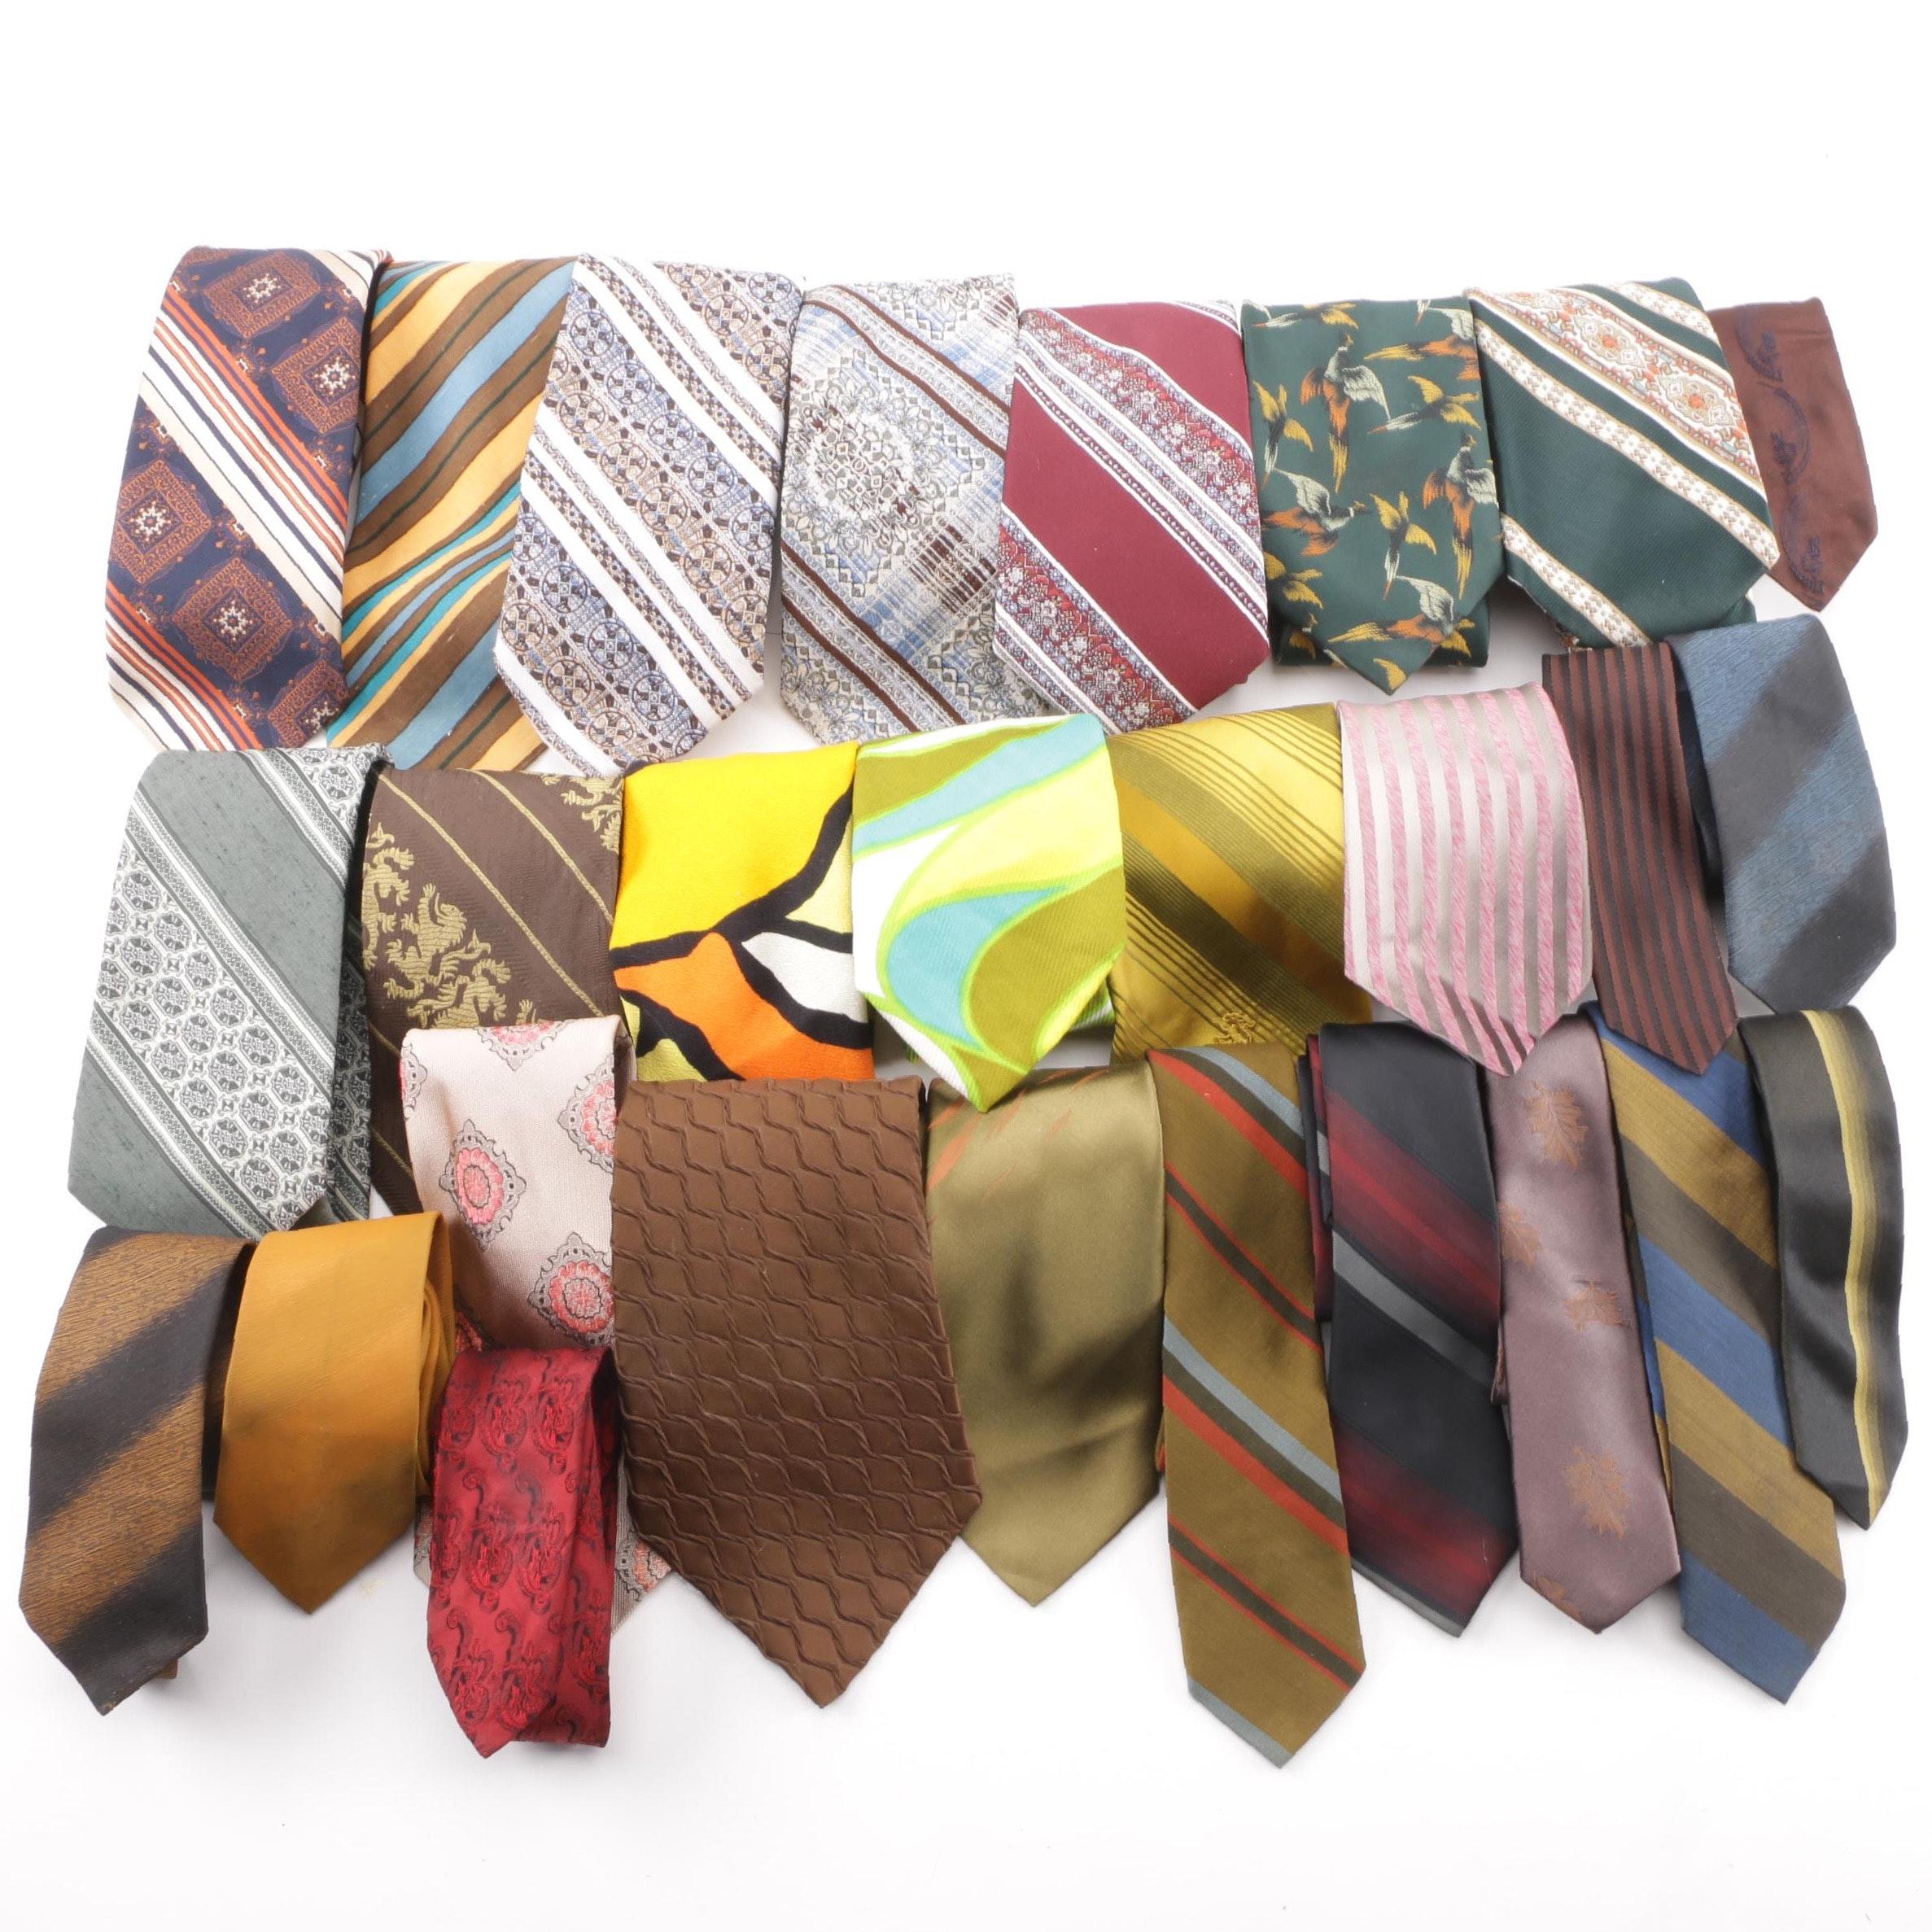 Men's Vintage Neckties including Johnny Carson and Wieboldt's